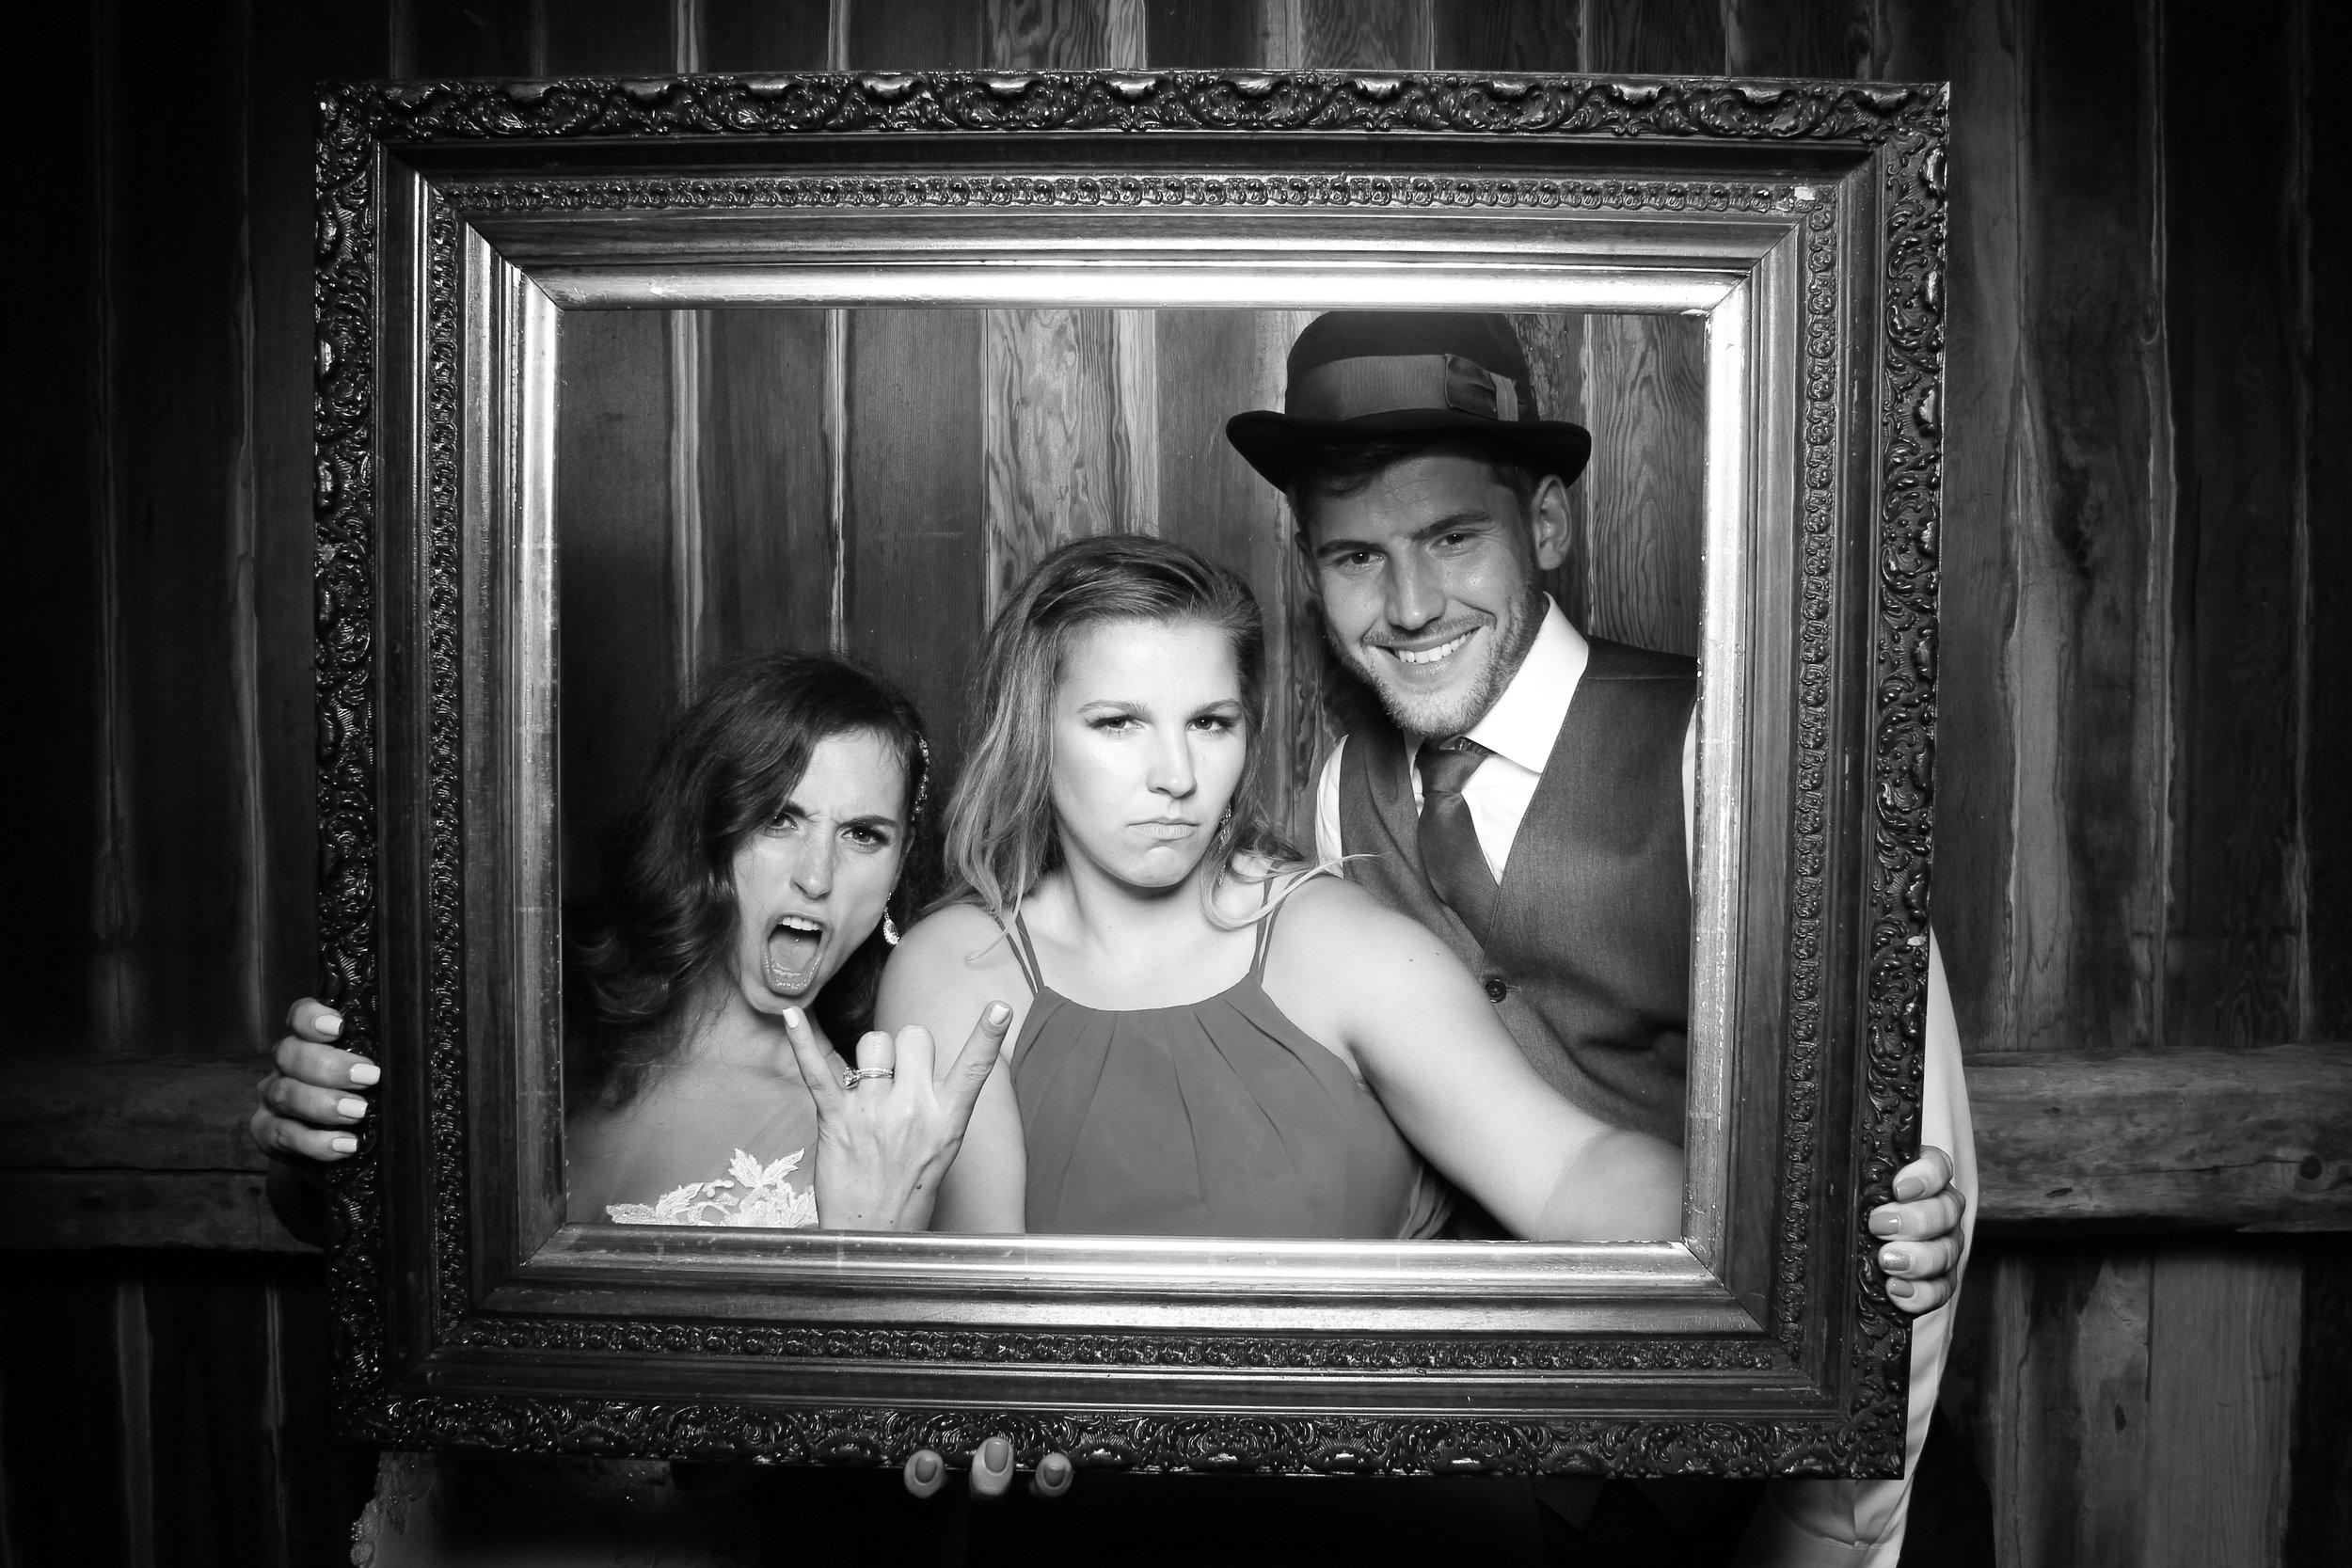 Chicago_Vintage_Wedding_Photobooth_26.jpg